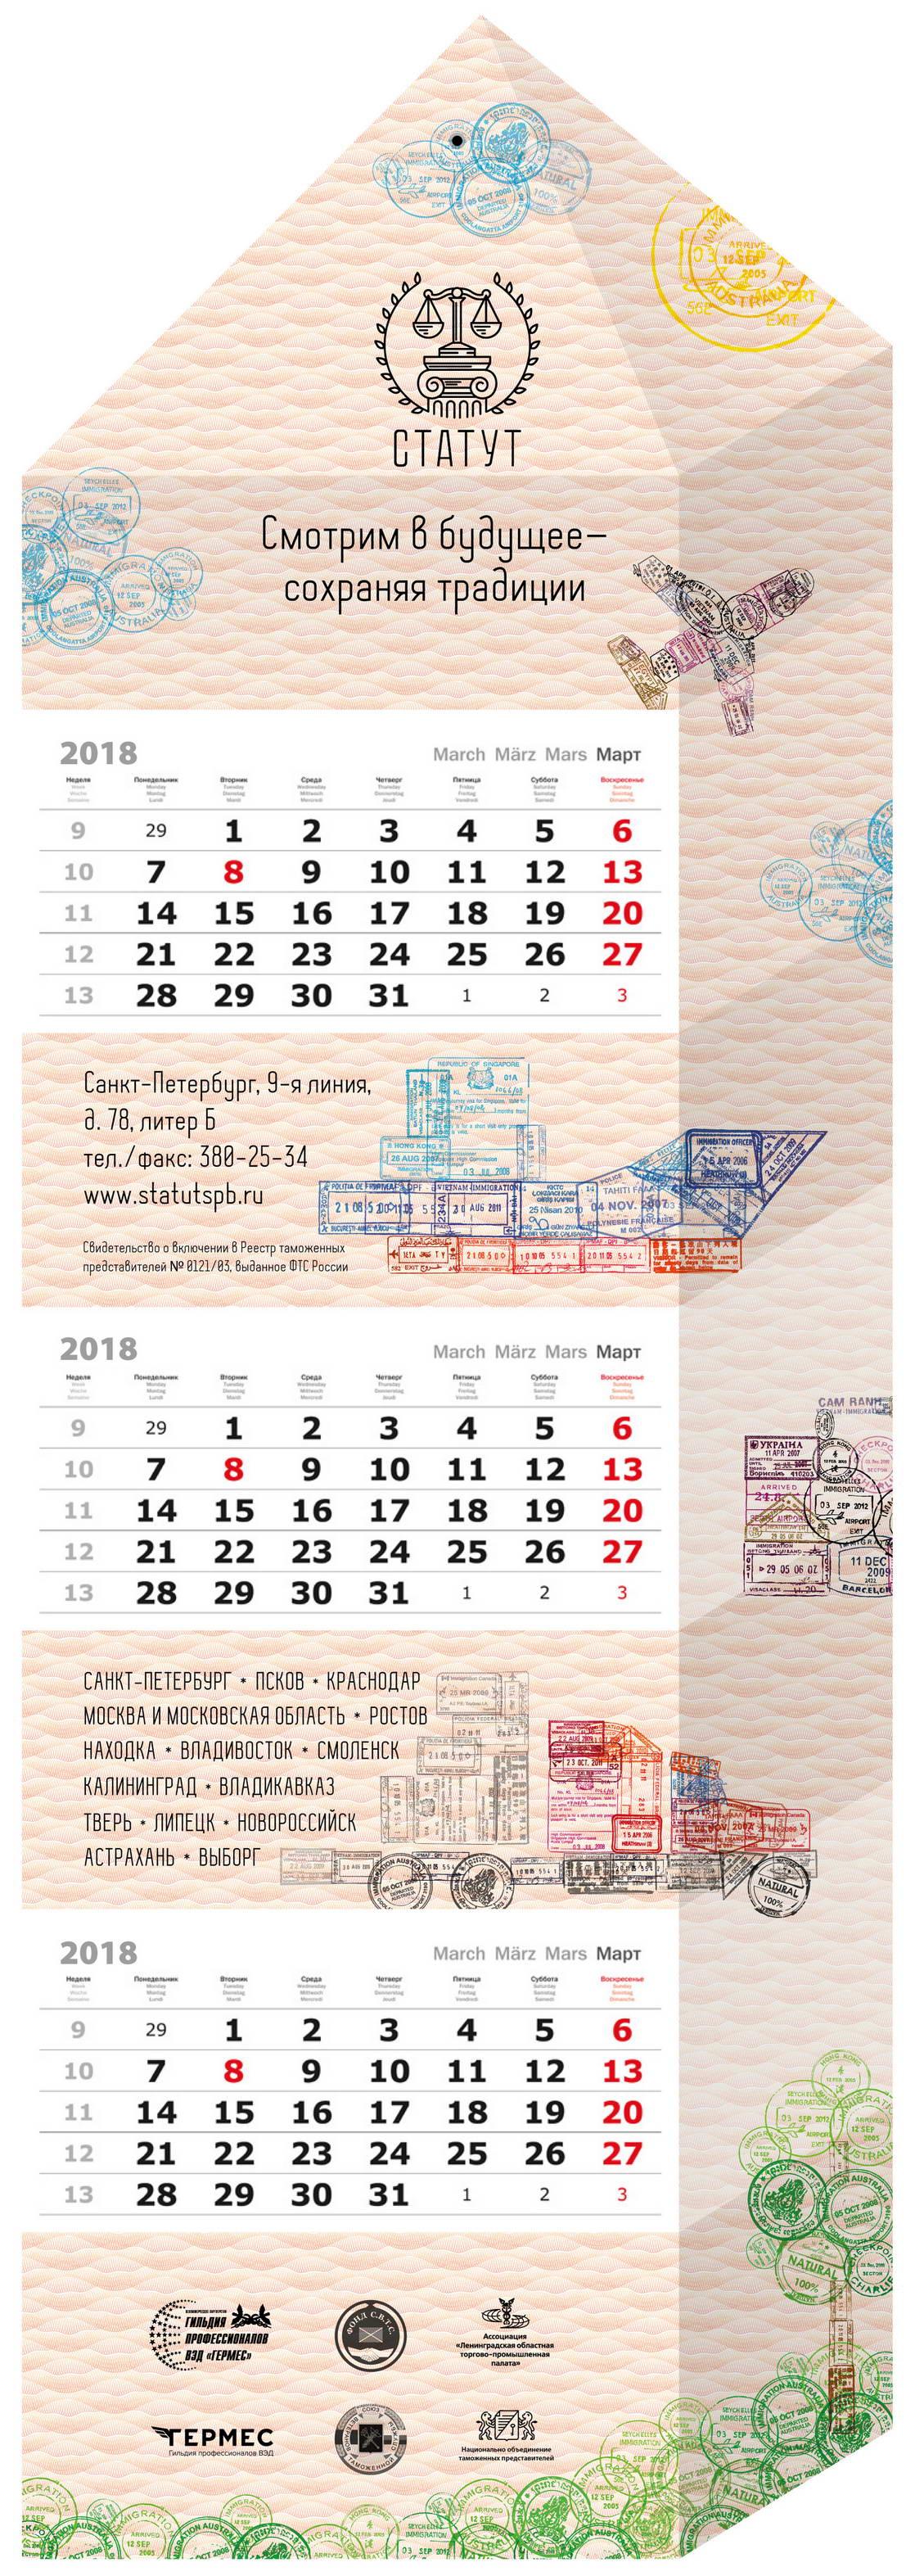 Diseño Carta trimestre calendario corporativo 2018